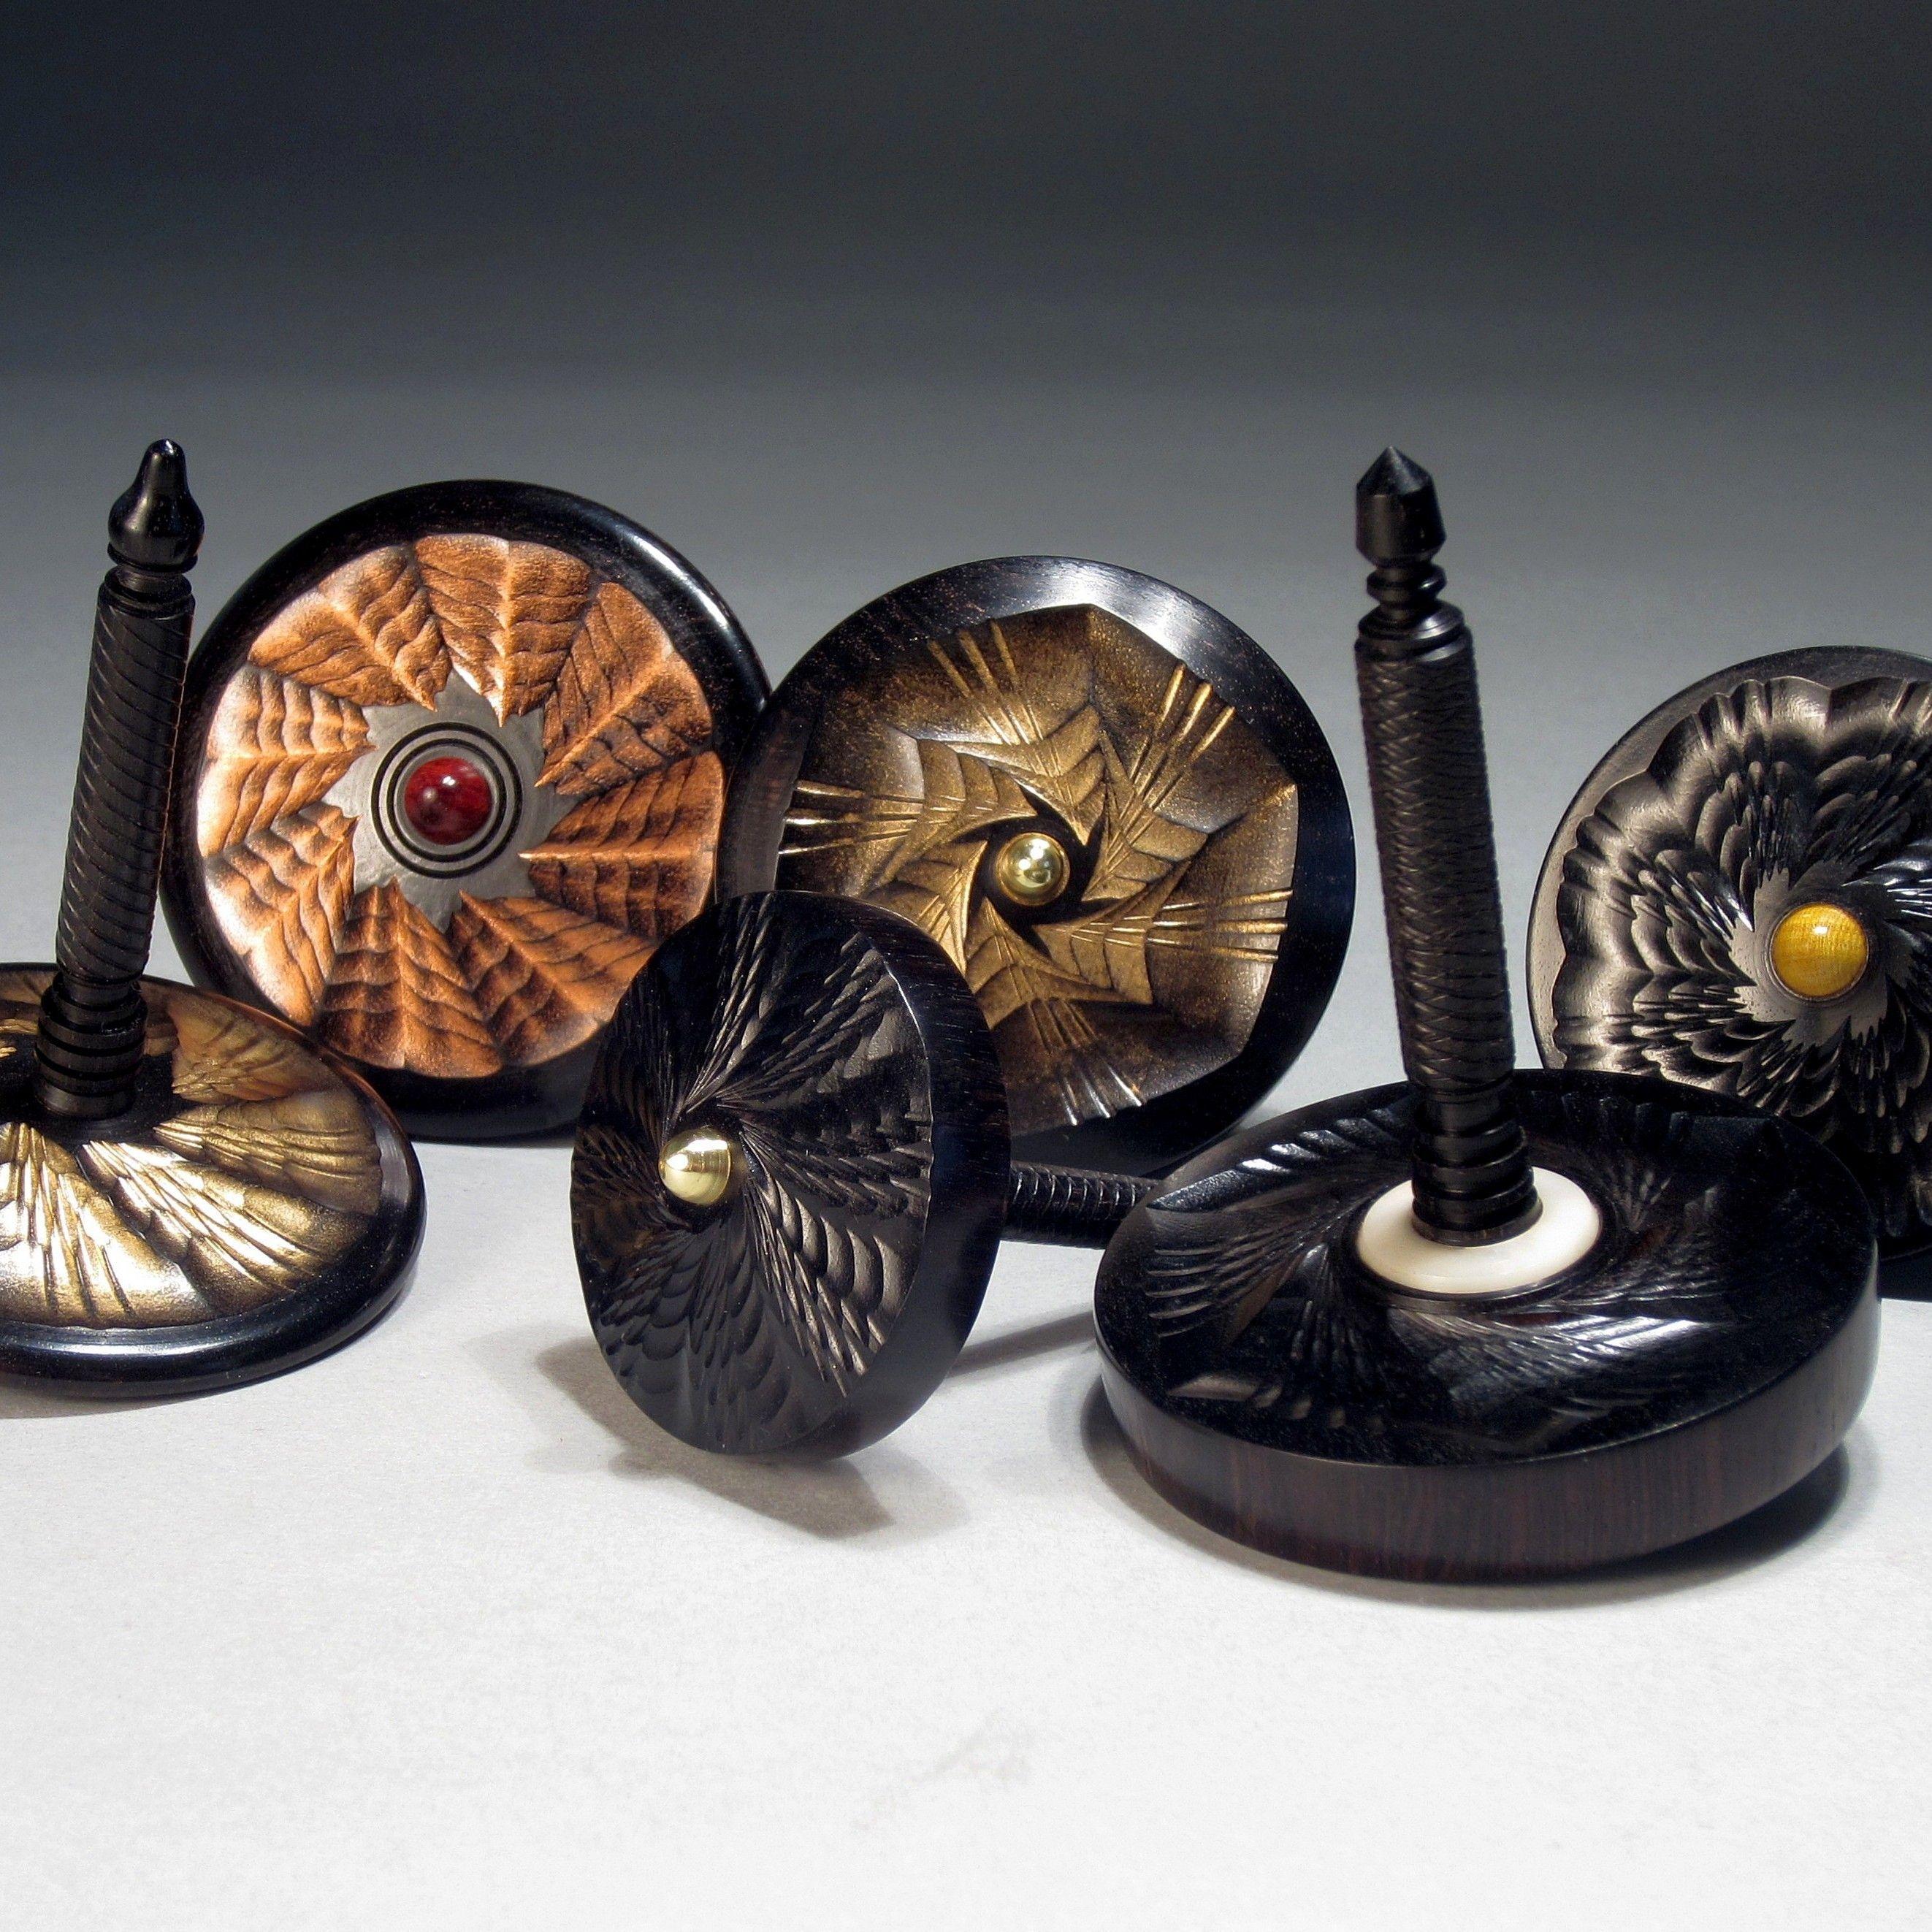 Js rose engine turned spin tops by jon sauer jon sauers js rose engine turned spin tops by jon sauer buycottarizona